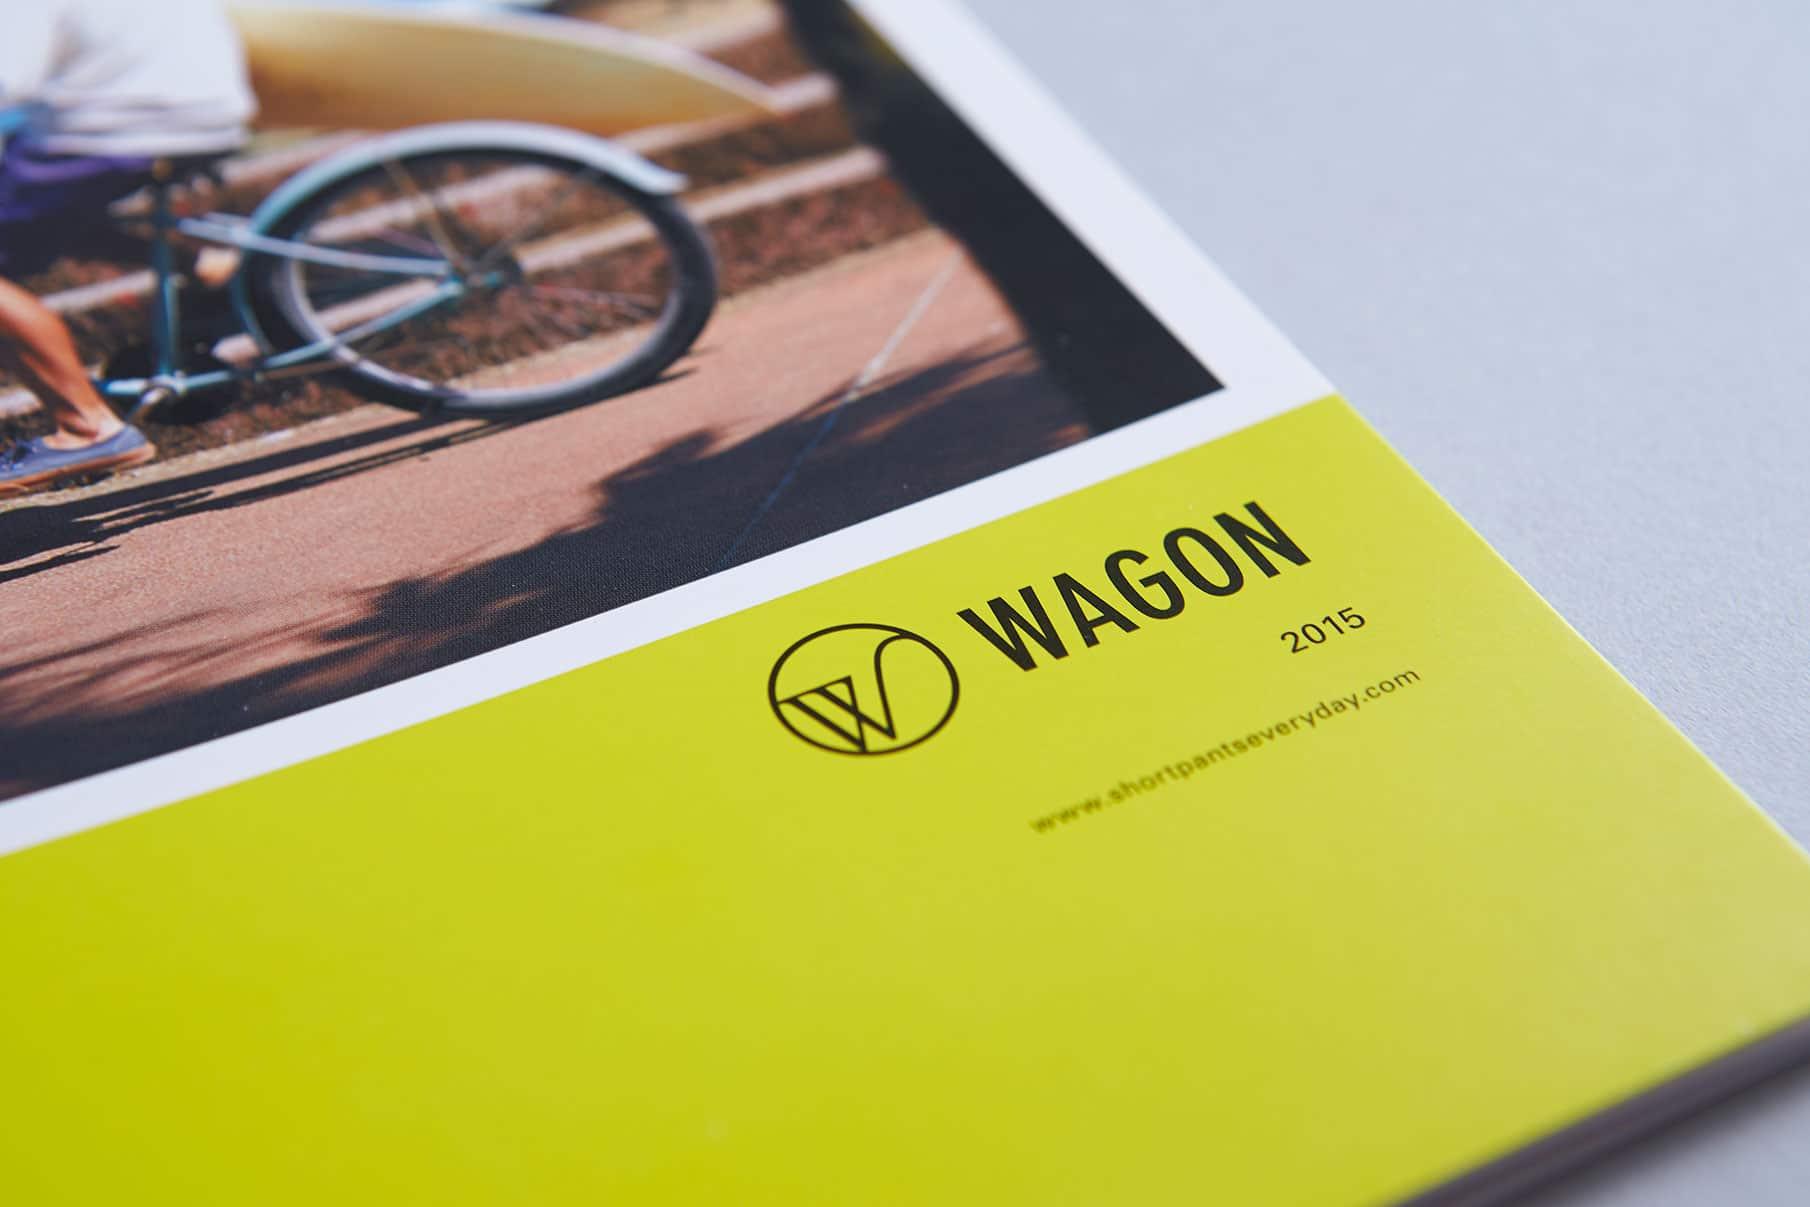 WAGON (short pants every day) - Catalog 3